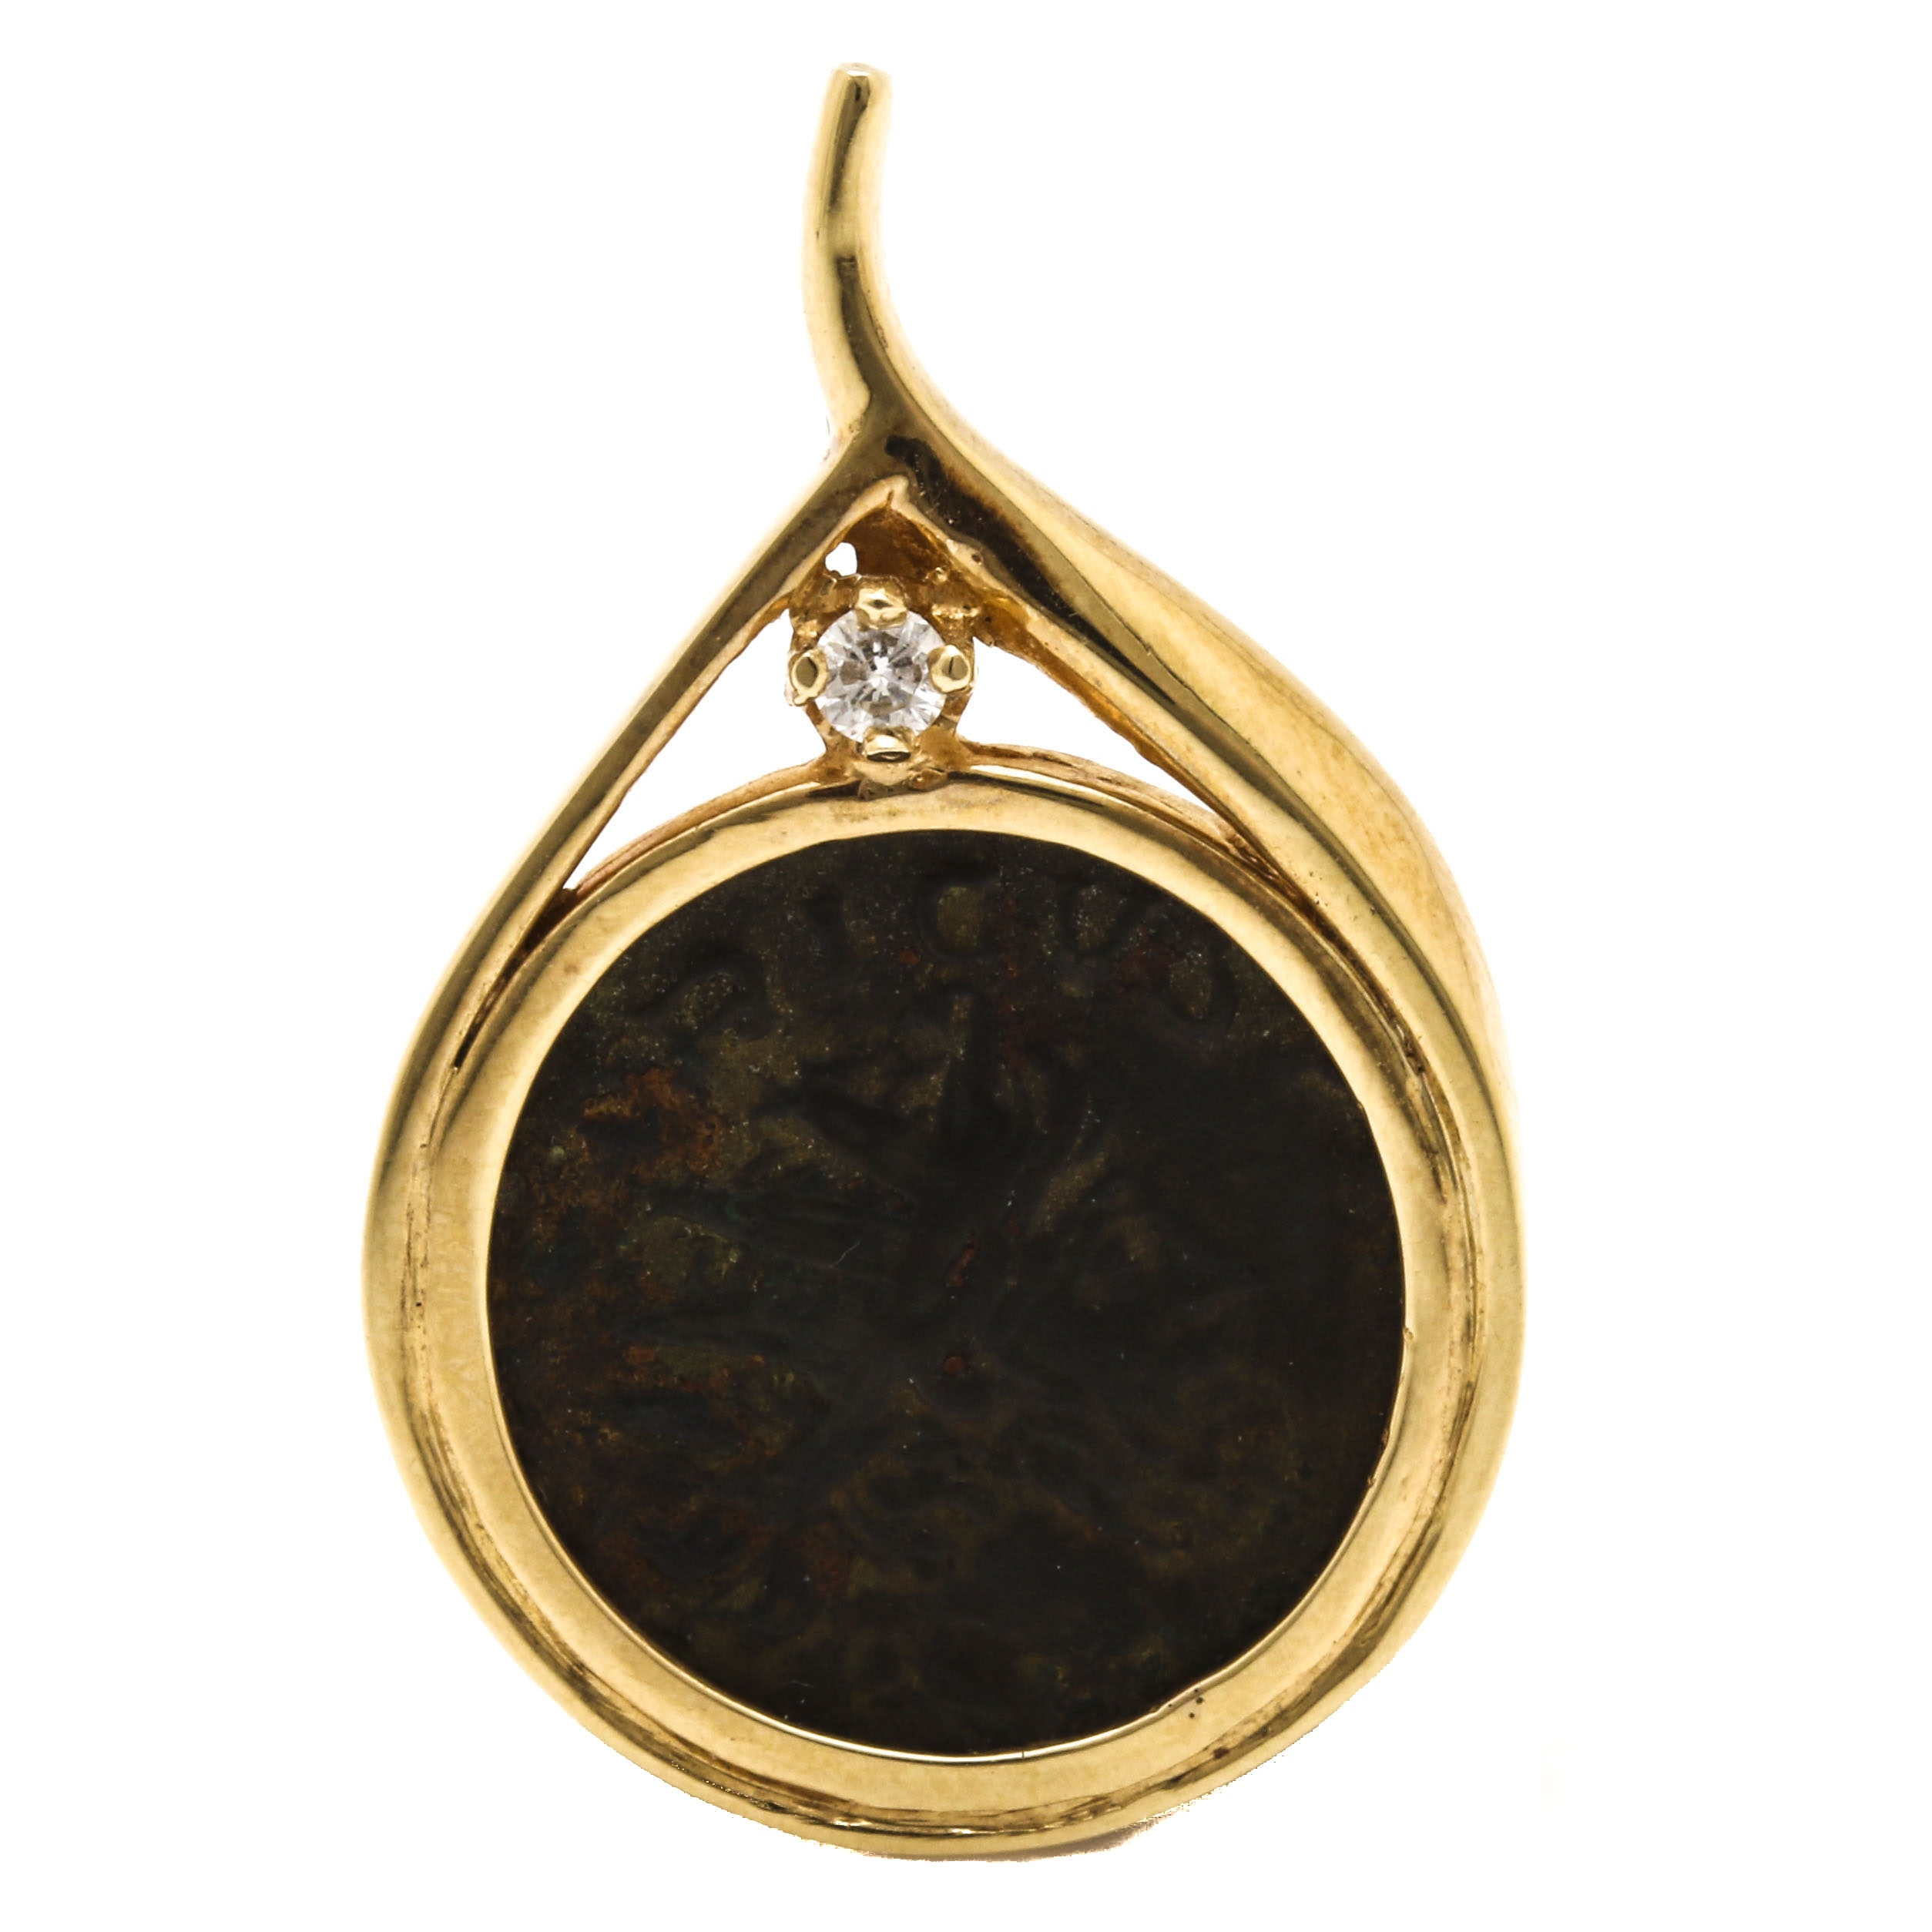 14K Yellow Gold and Diamond Ancient Roman Coin Replica Pendant